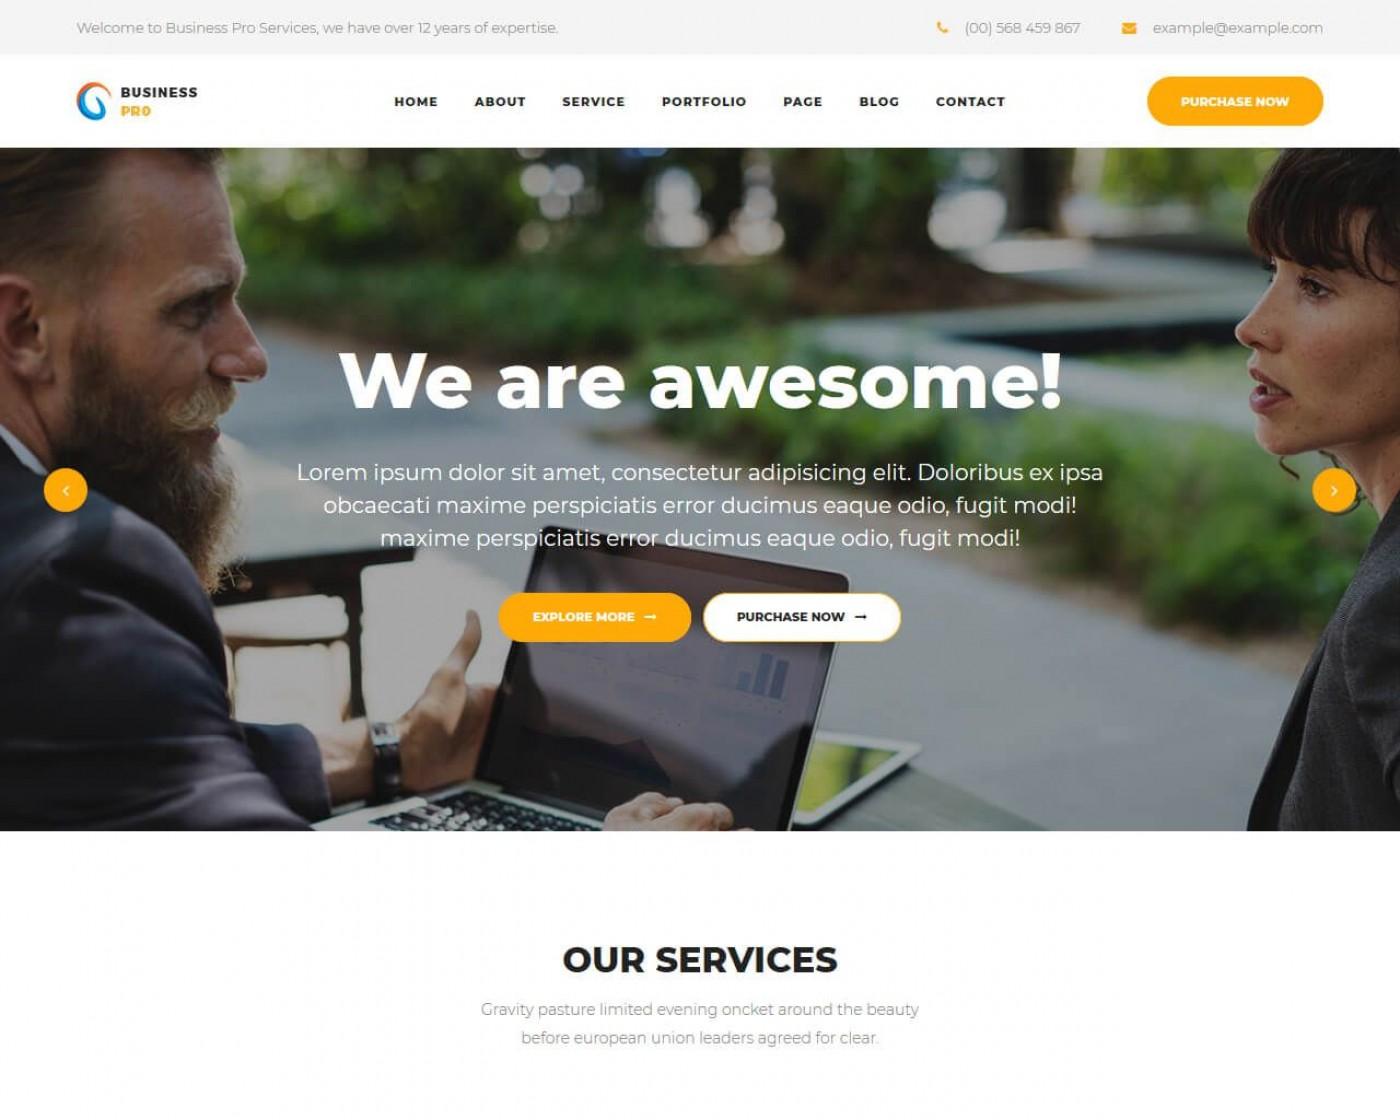 006 Impressive Professional Busines Website Template Free Download Wordpres Picture 1400